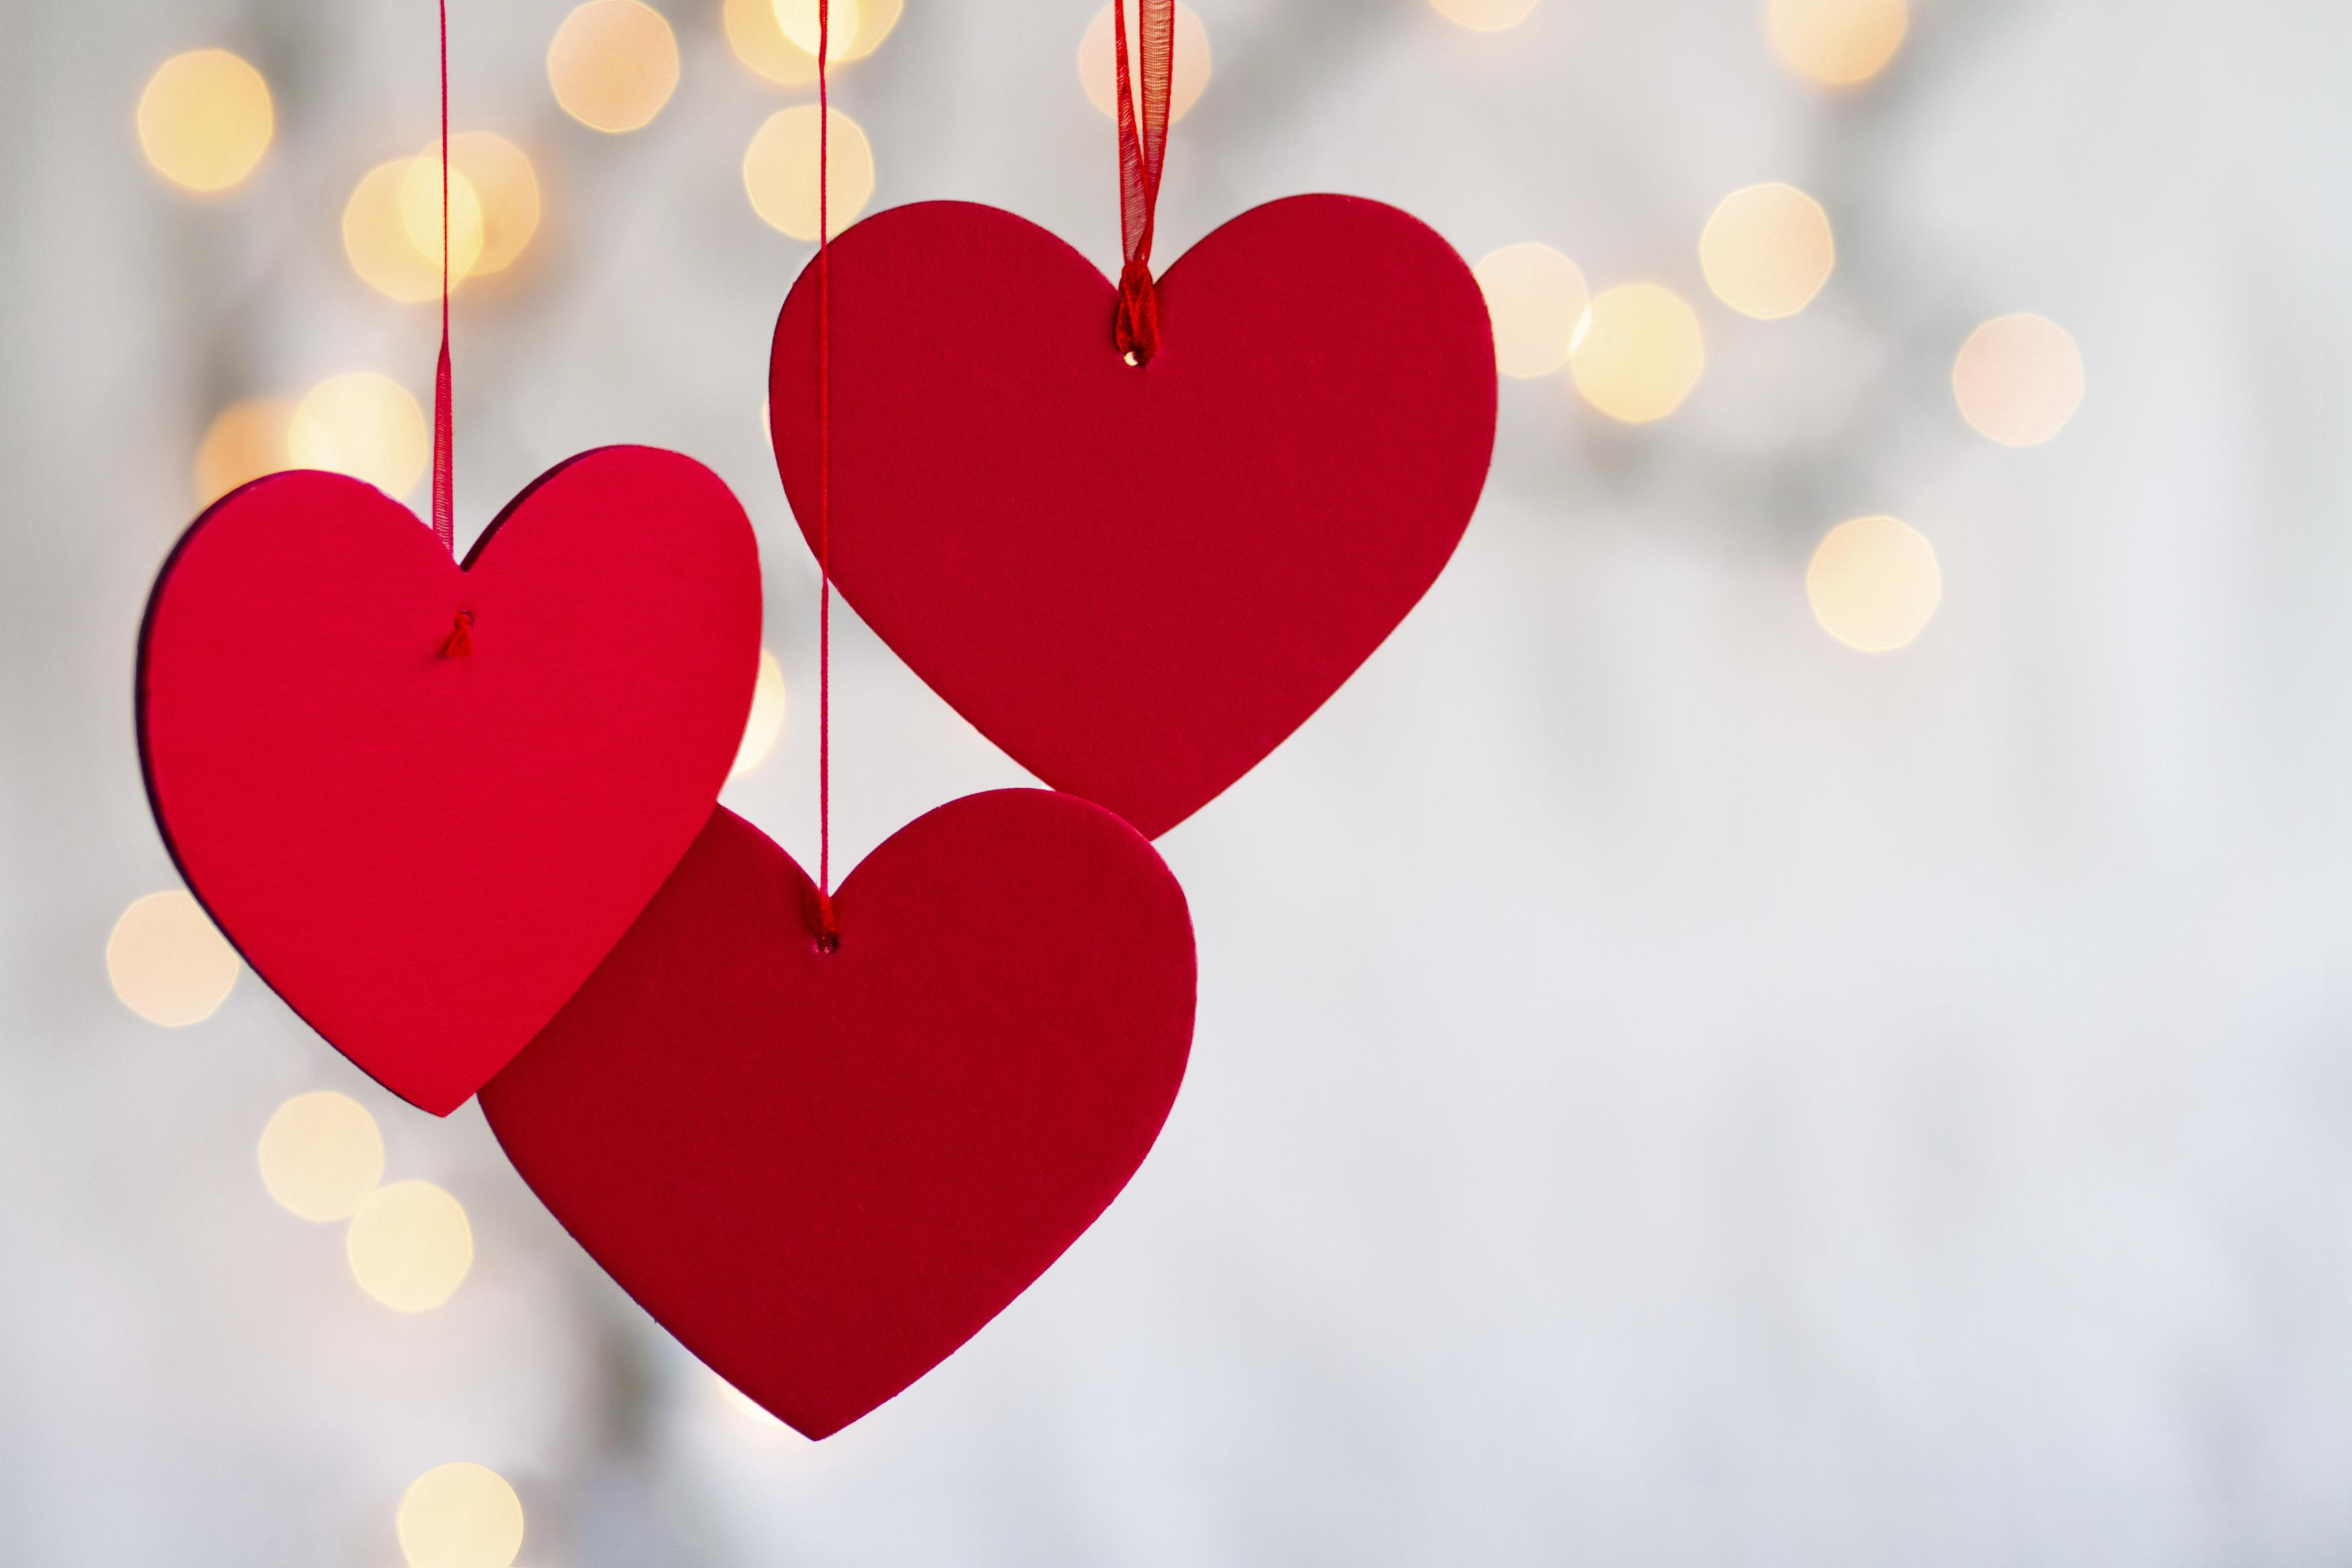 pftw: valentines day wallpaper